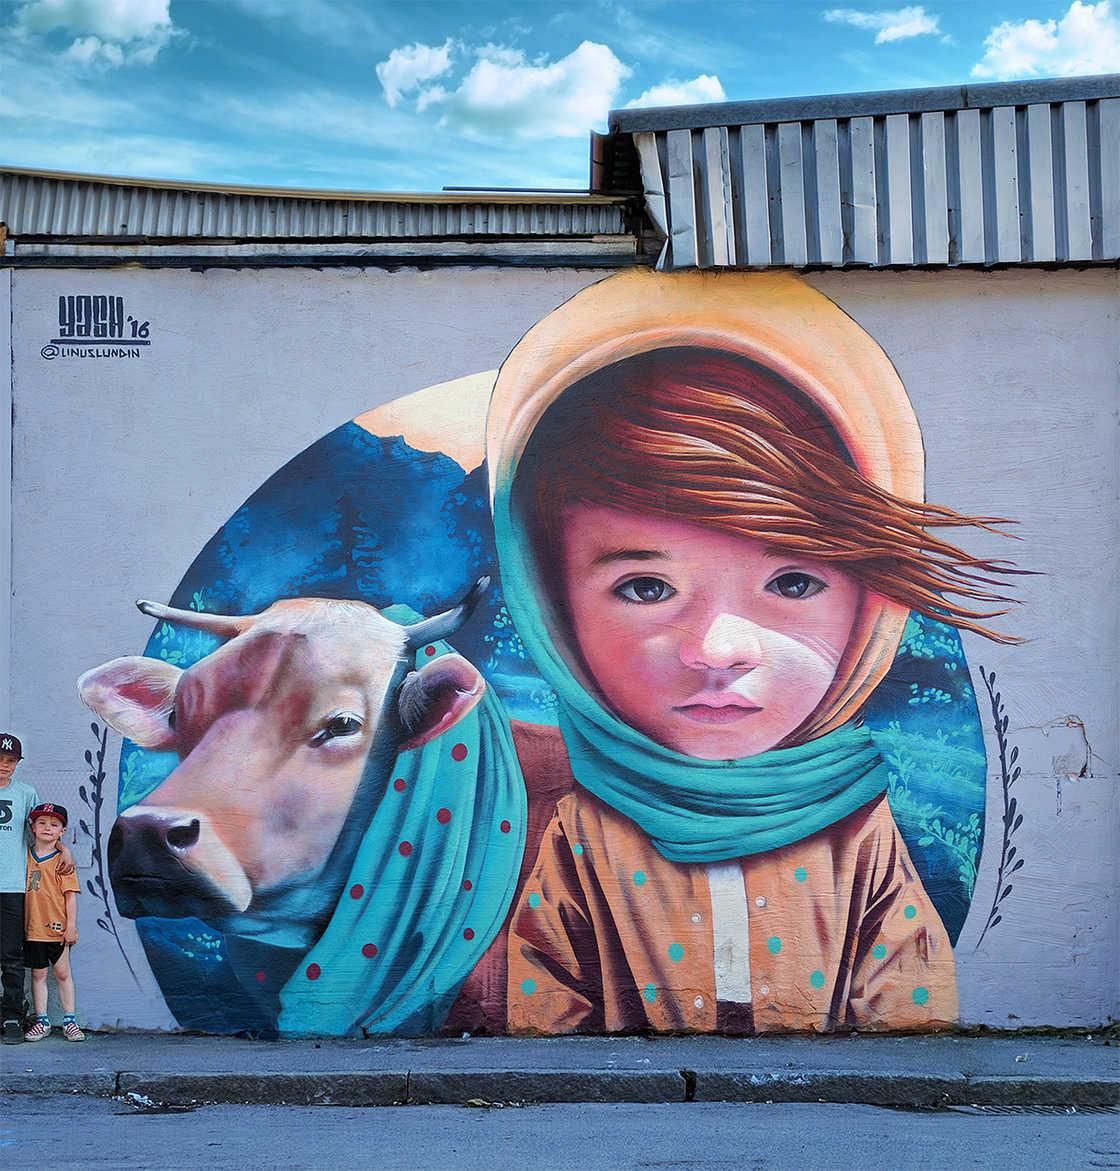 yash-one-street-art-9.jpg